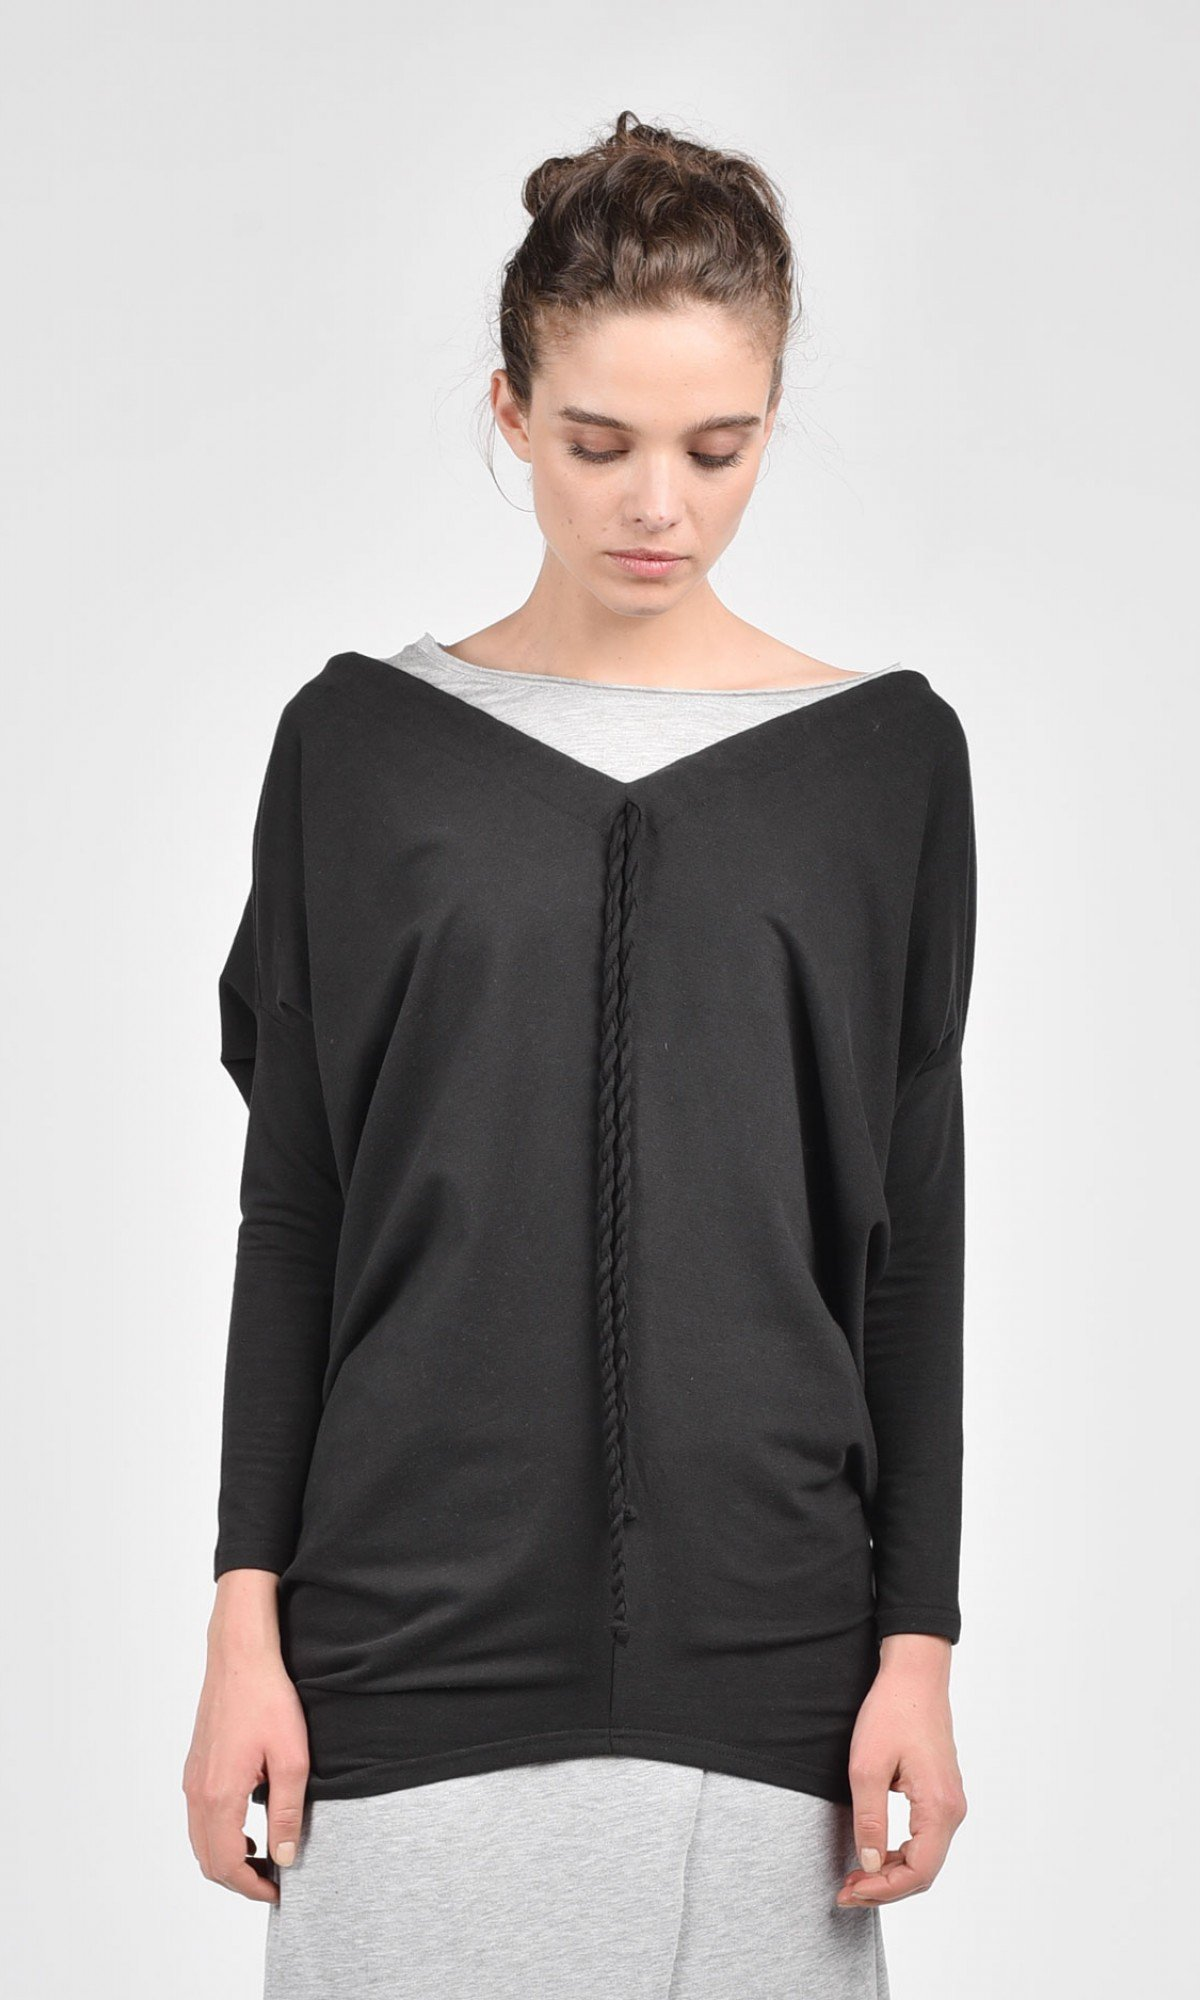 Extravagant Black Tunic A02185